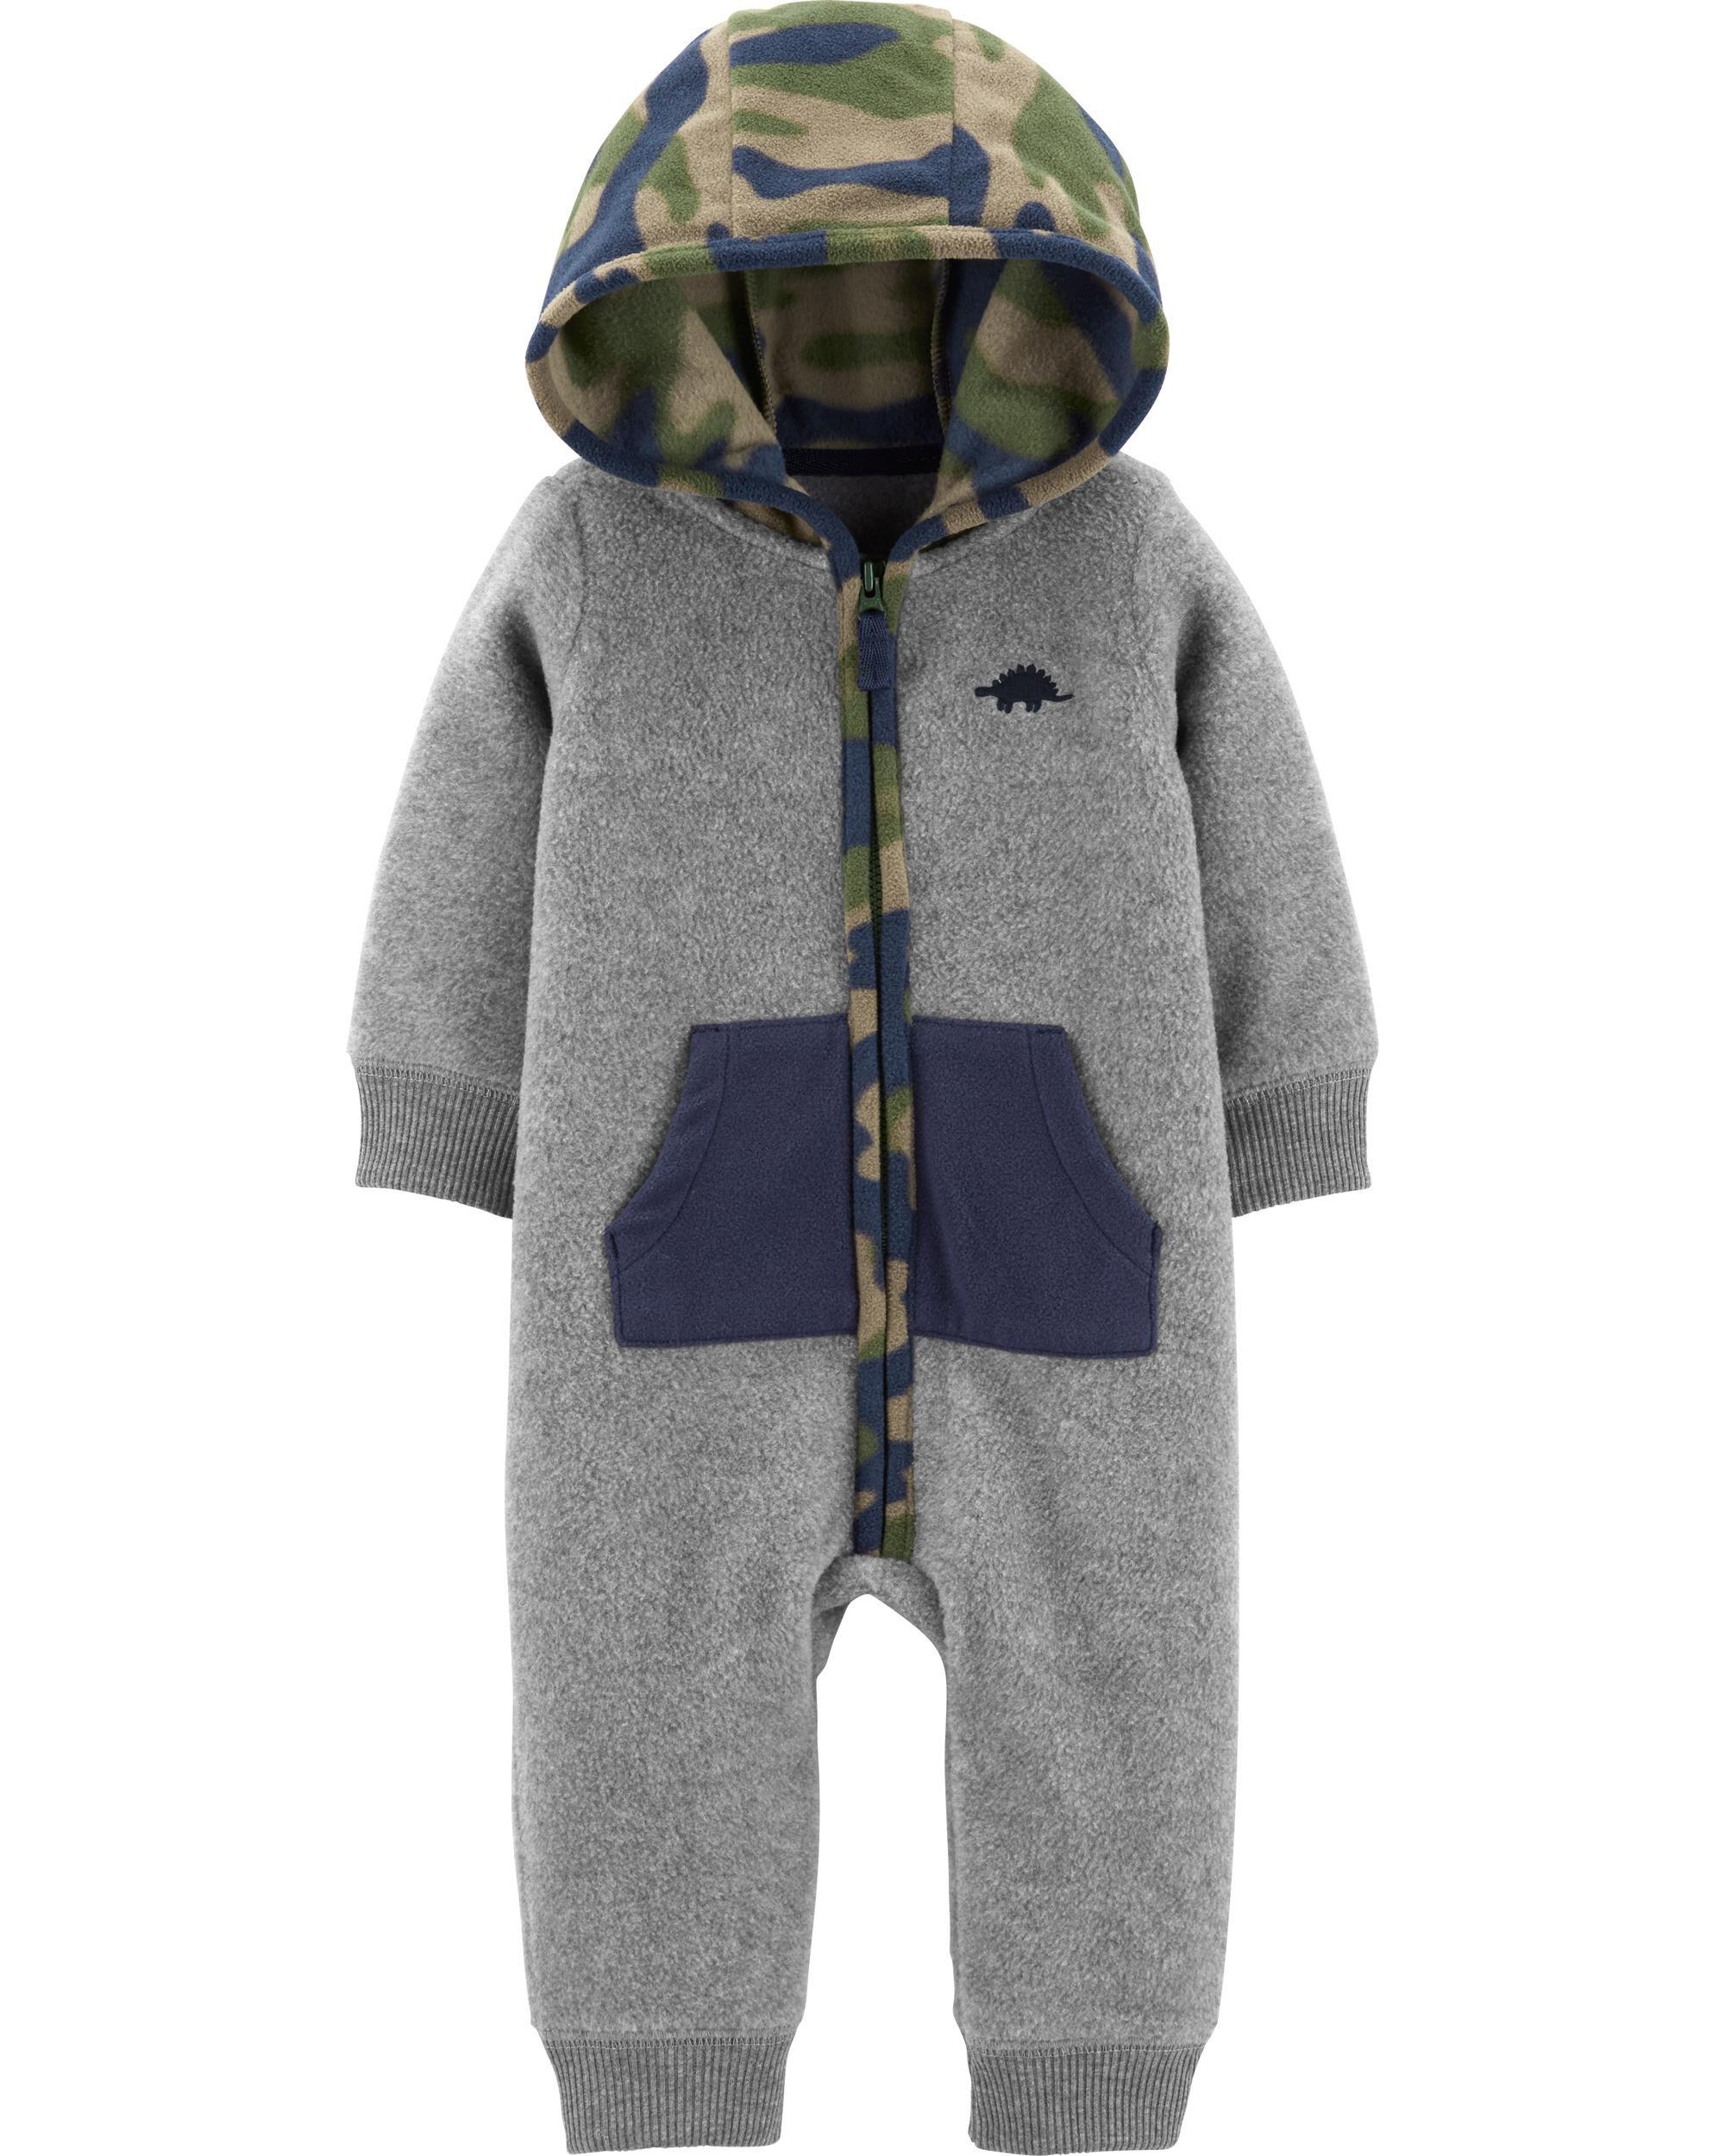 *CLEARANCE* Hooded Fleece Jumpsuit